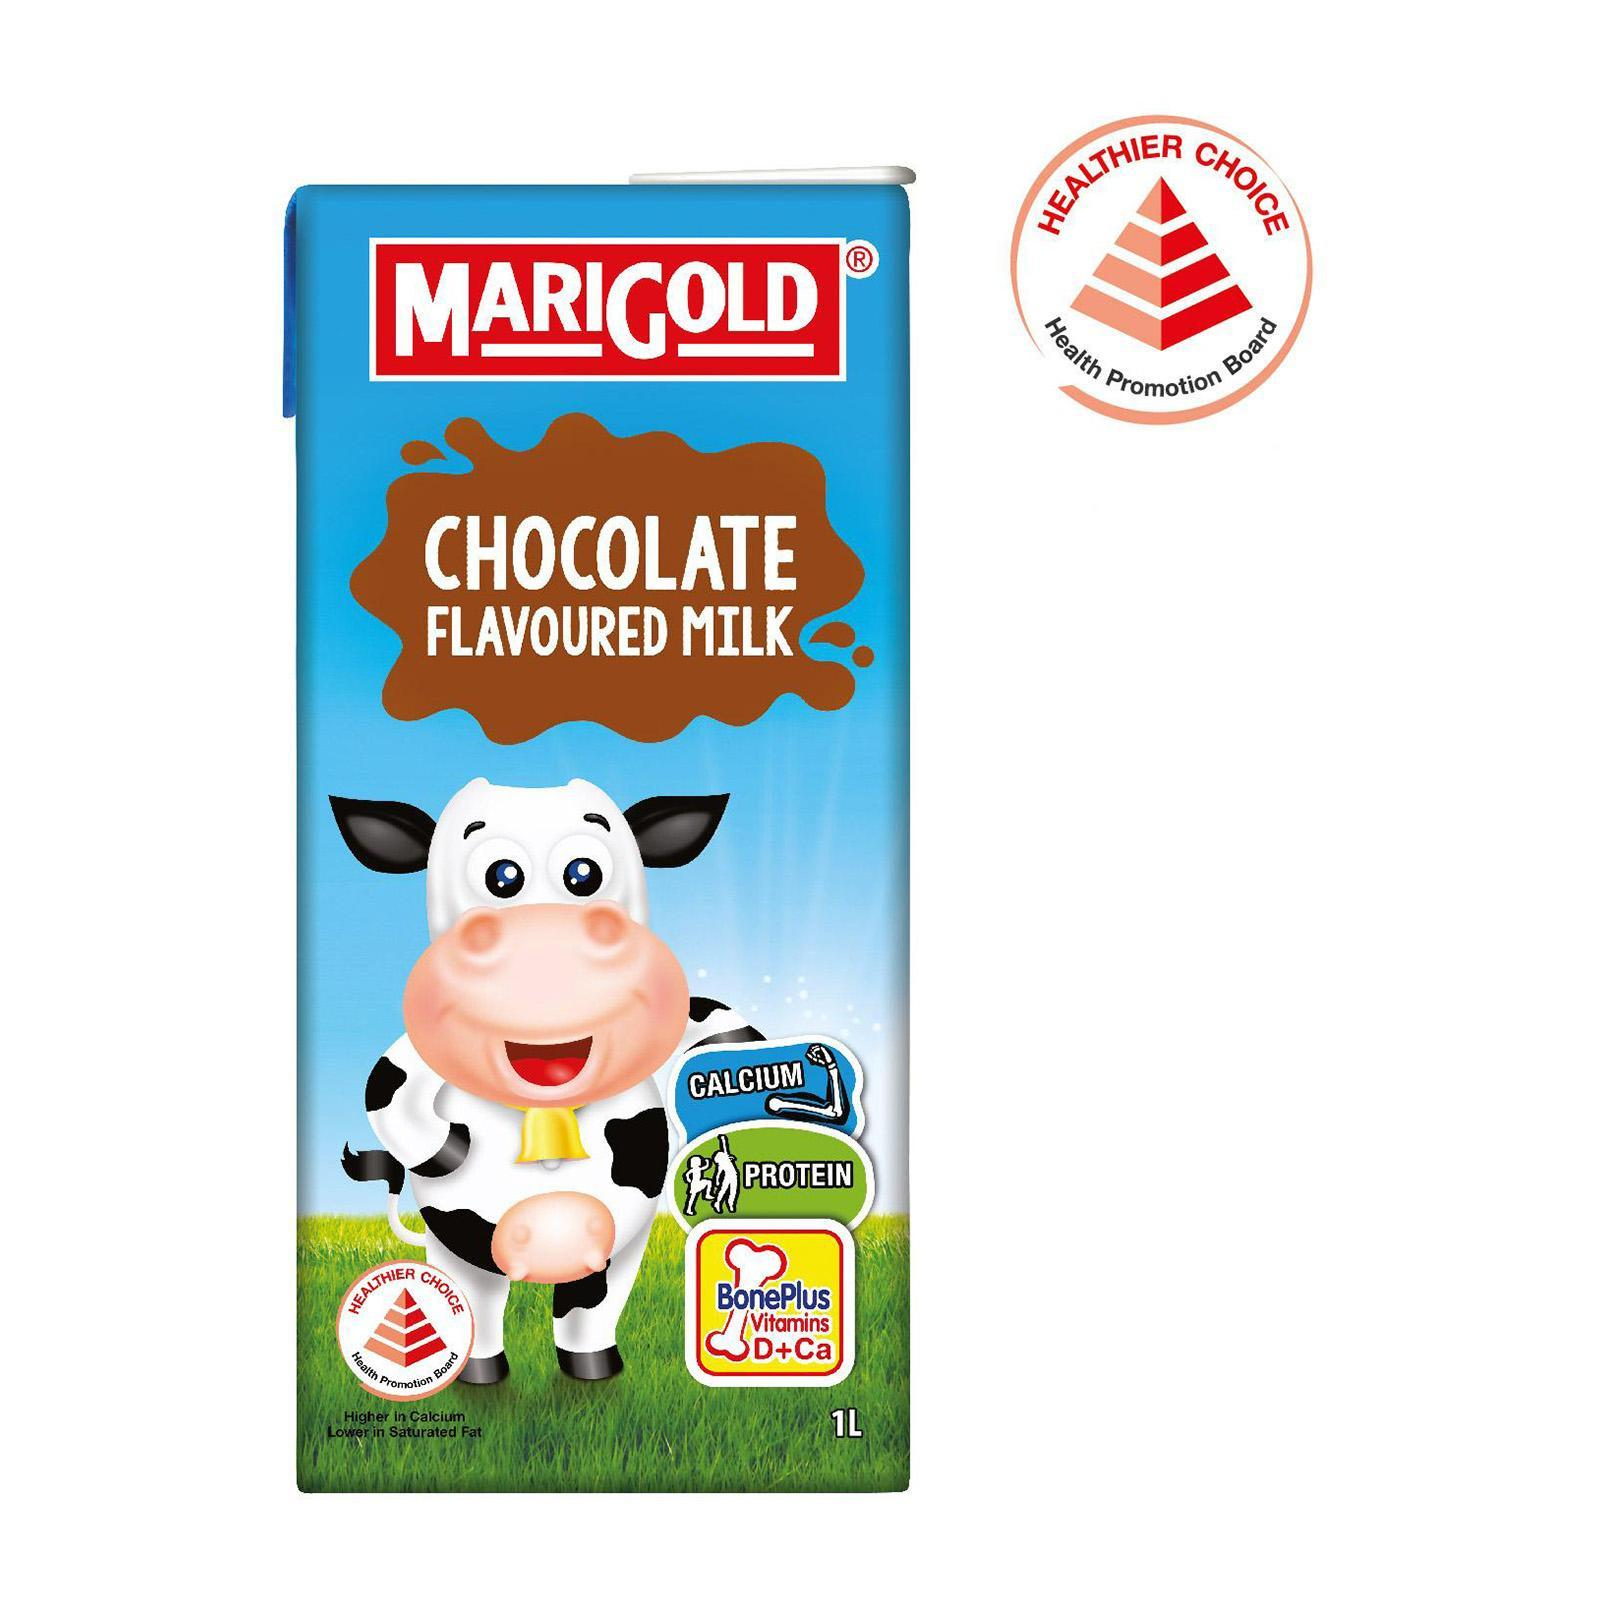 Marigold Uht Chocolate Milk By Redmart.